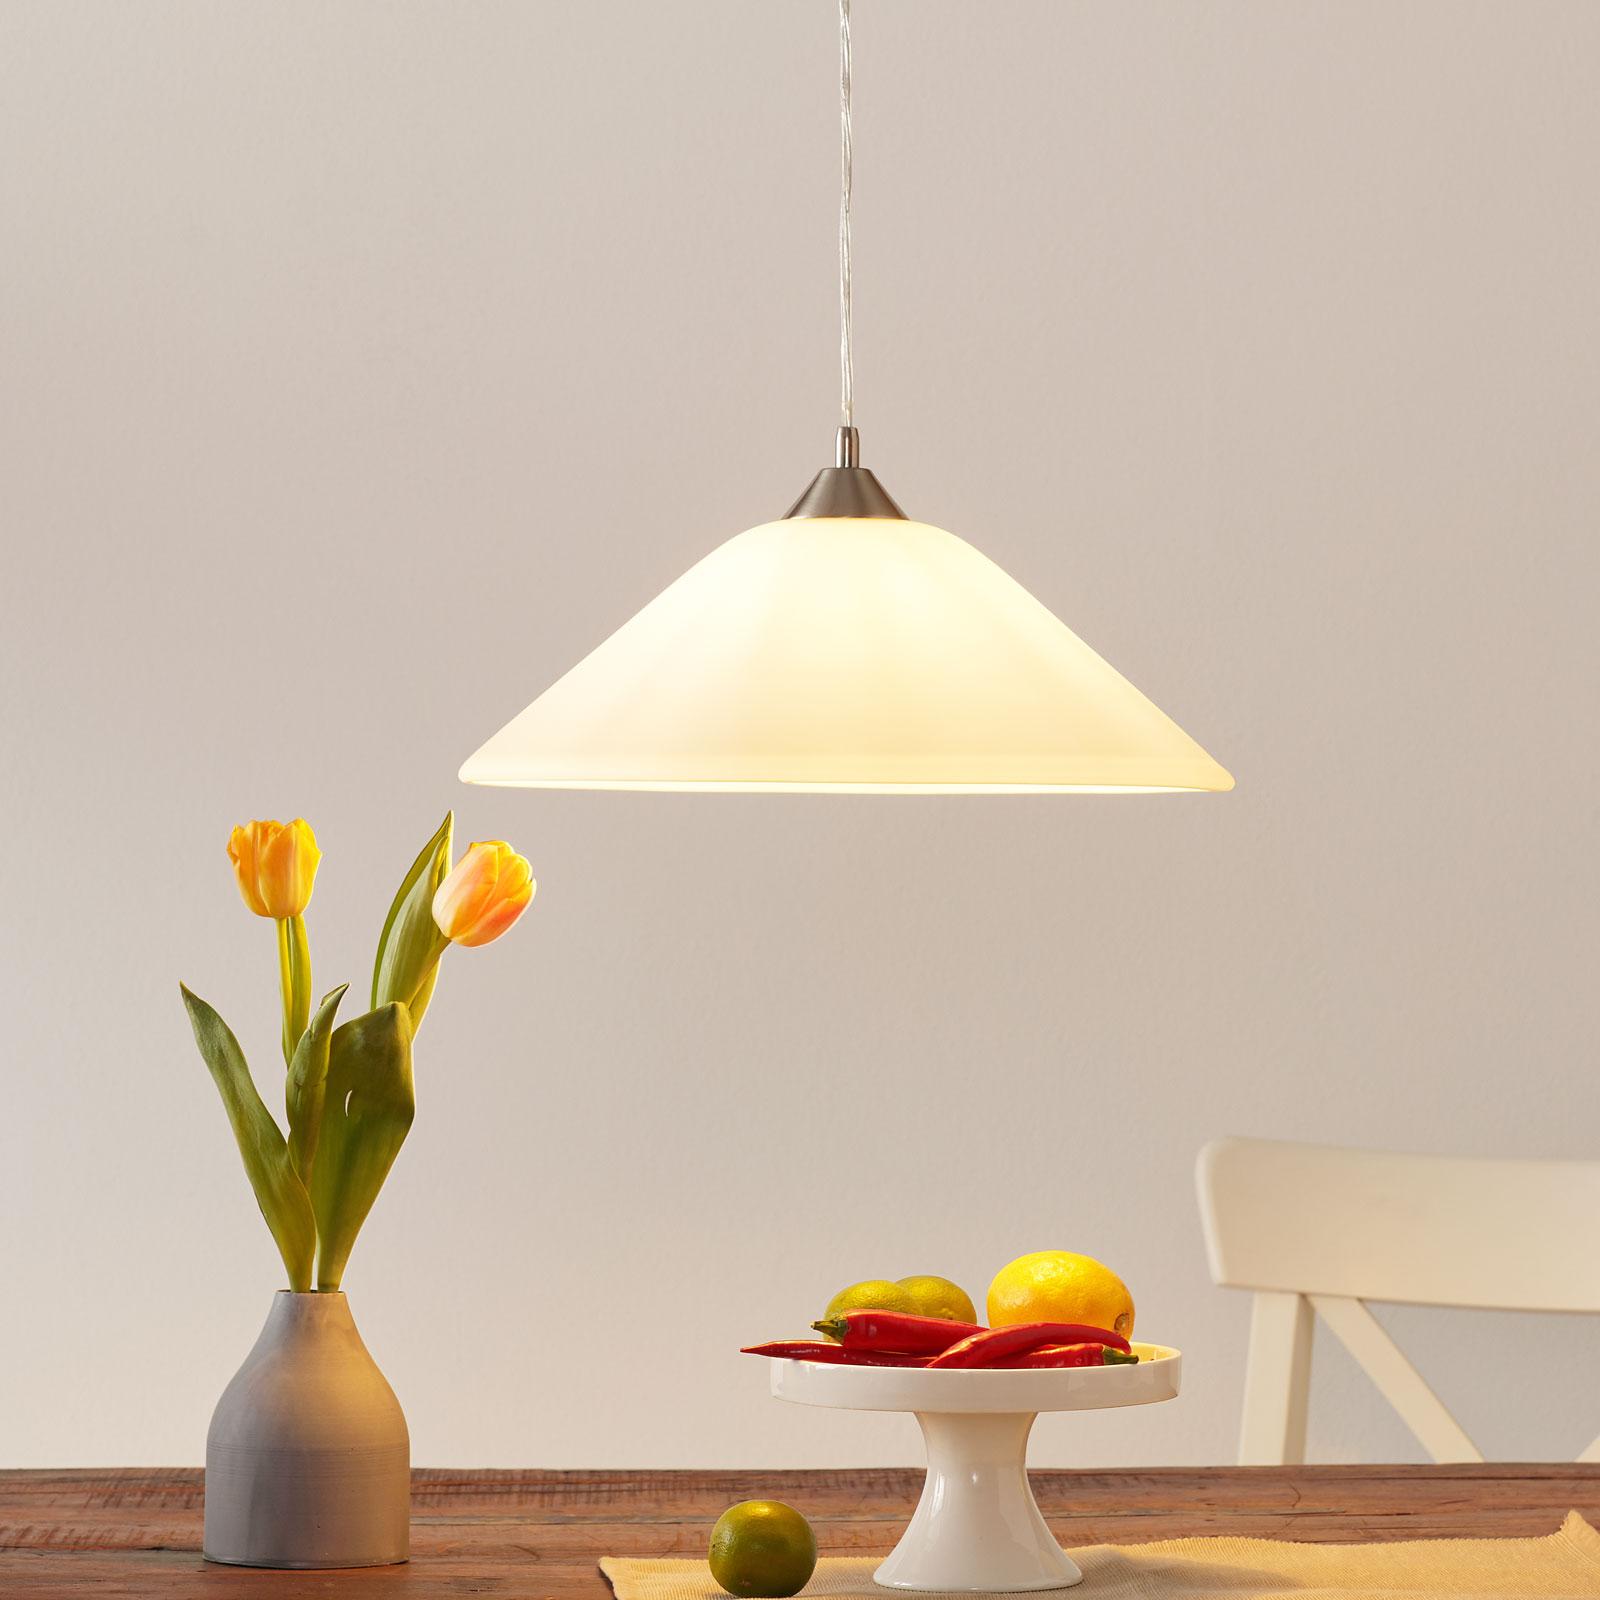 Lampada a sospensione LOISA -vetro opalino nichel